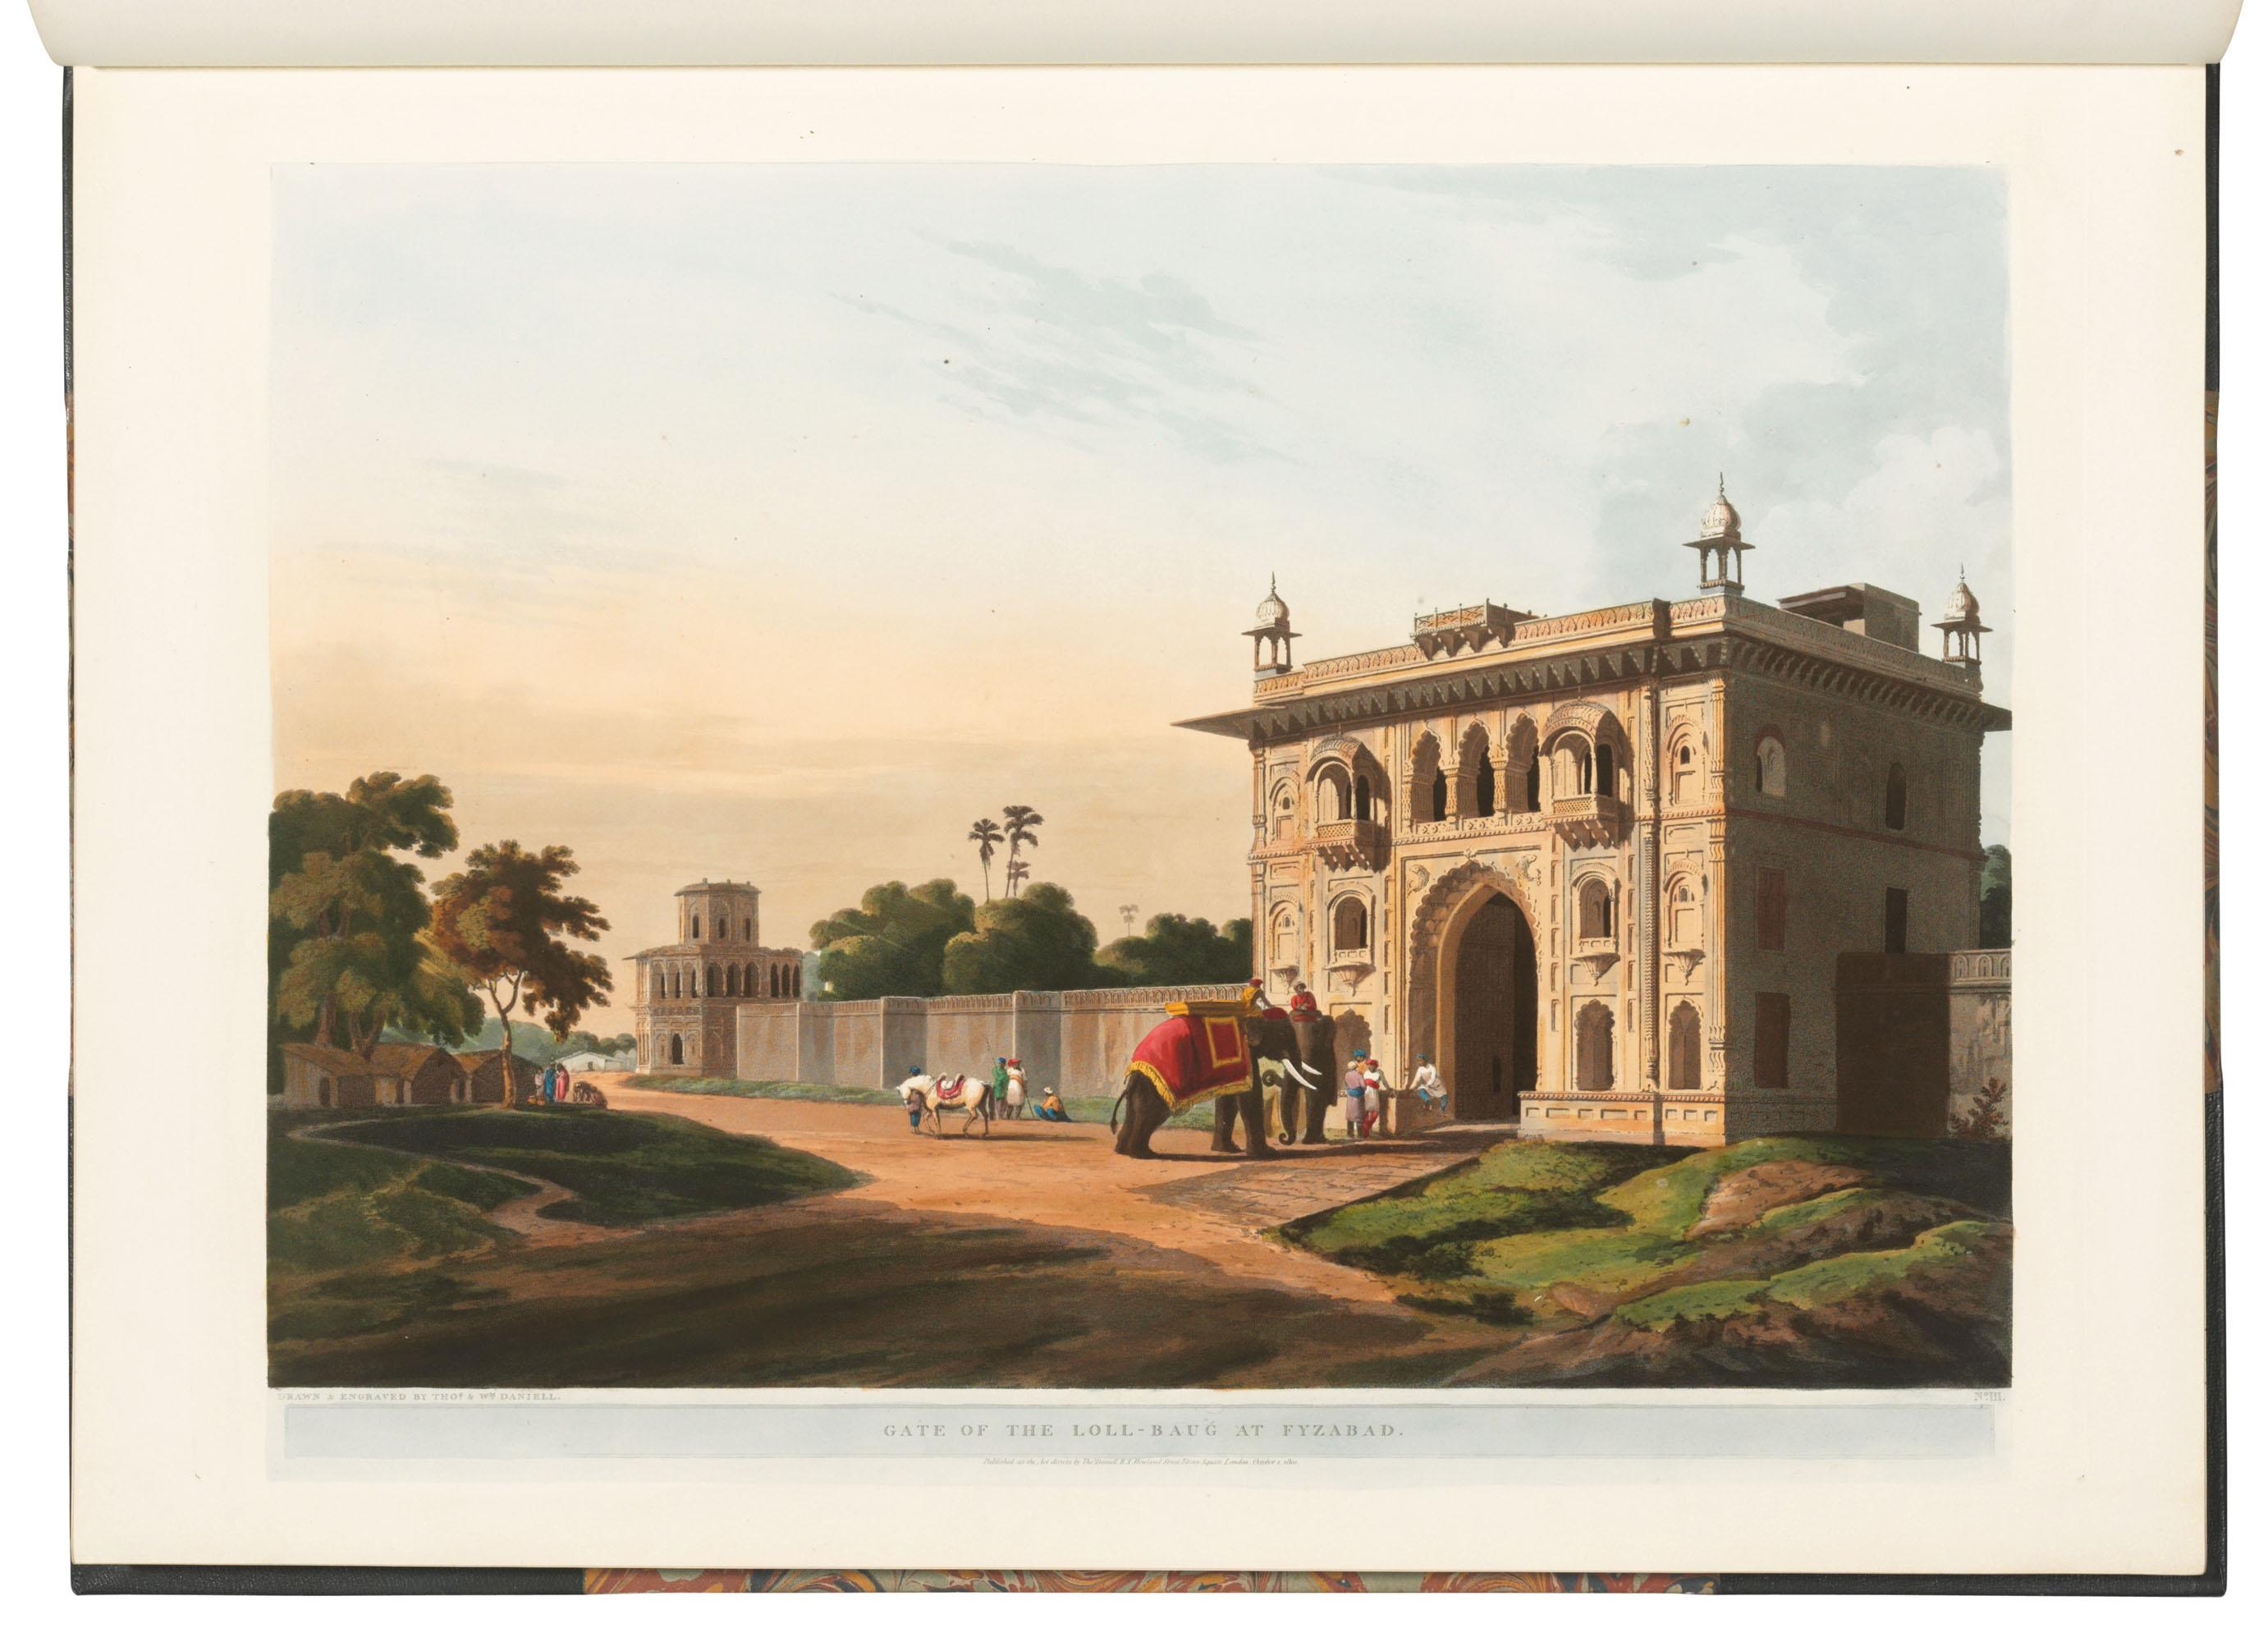 Thomas (1749-1840) and William DANIELL (1769-1837).